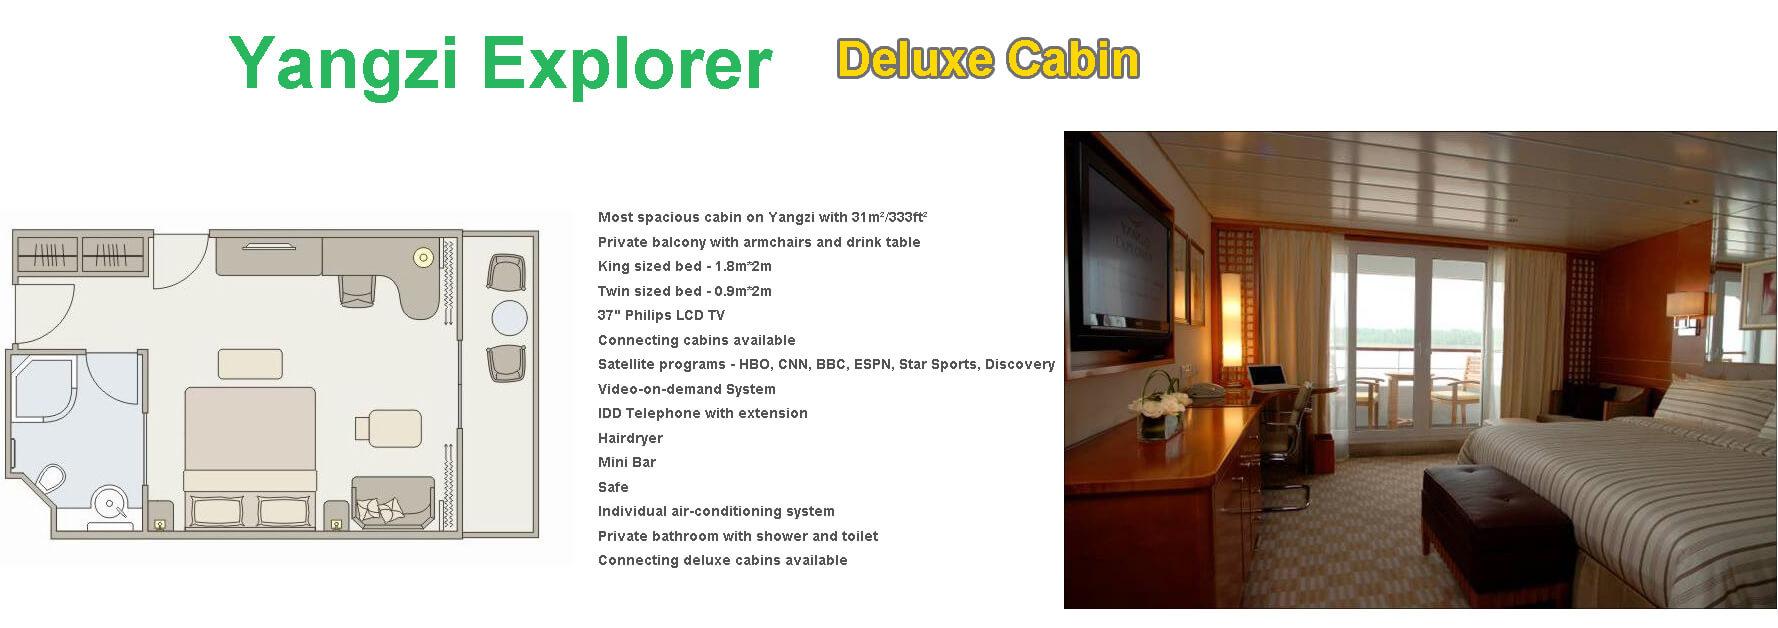 Yangzi Explorer deluxe suite-Yangtze River Cruise